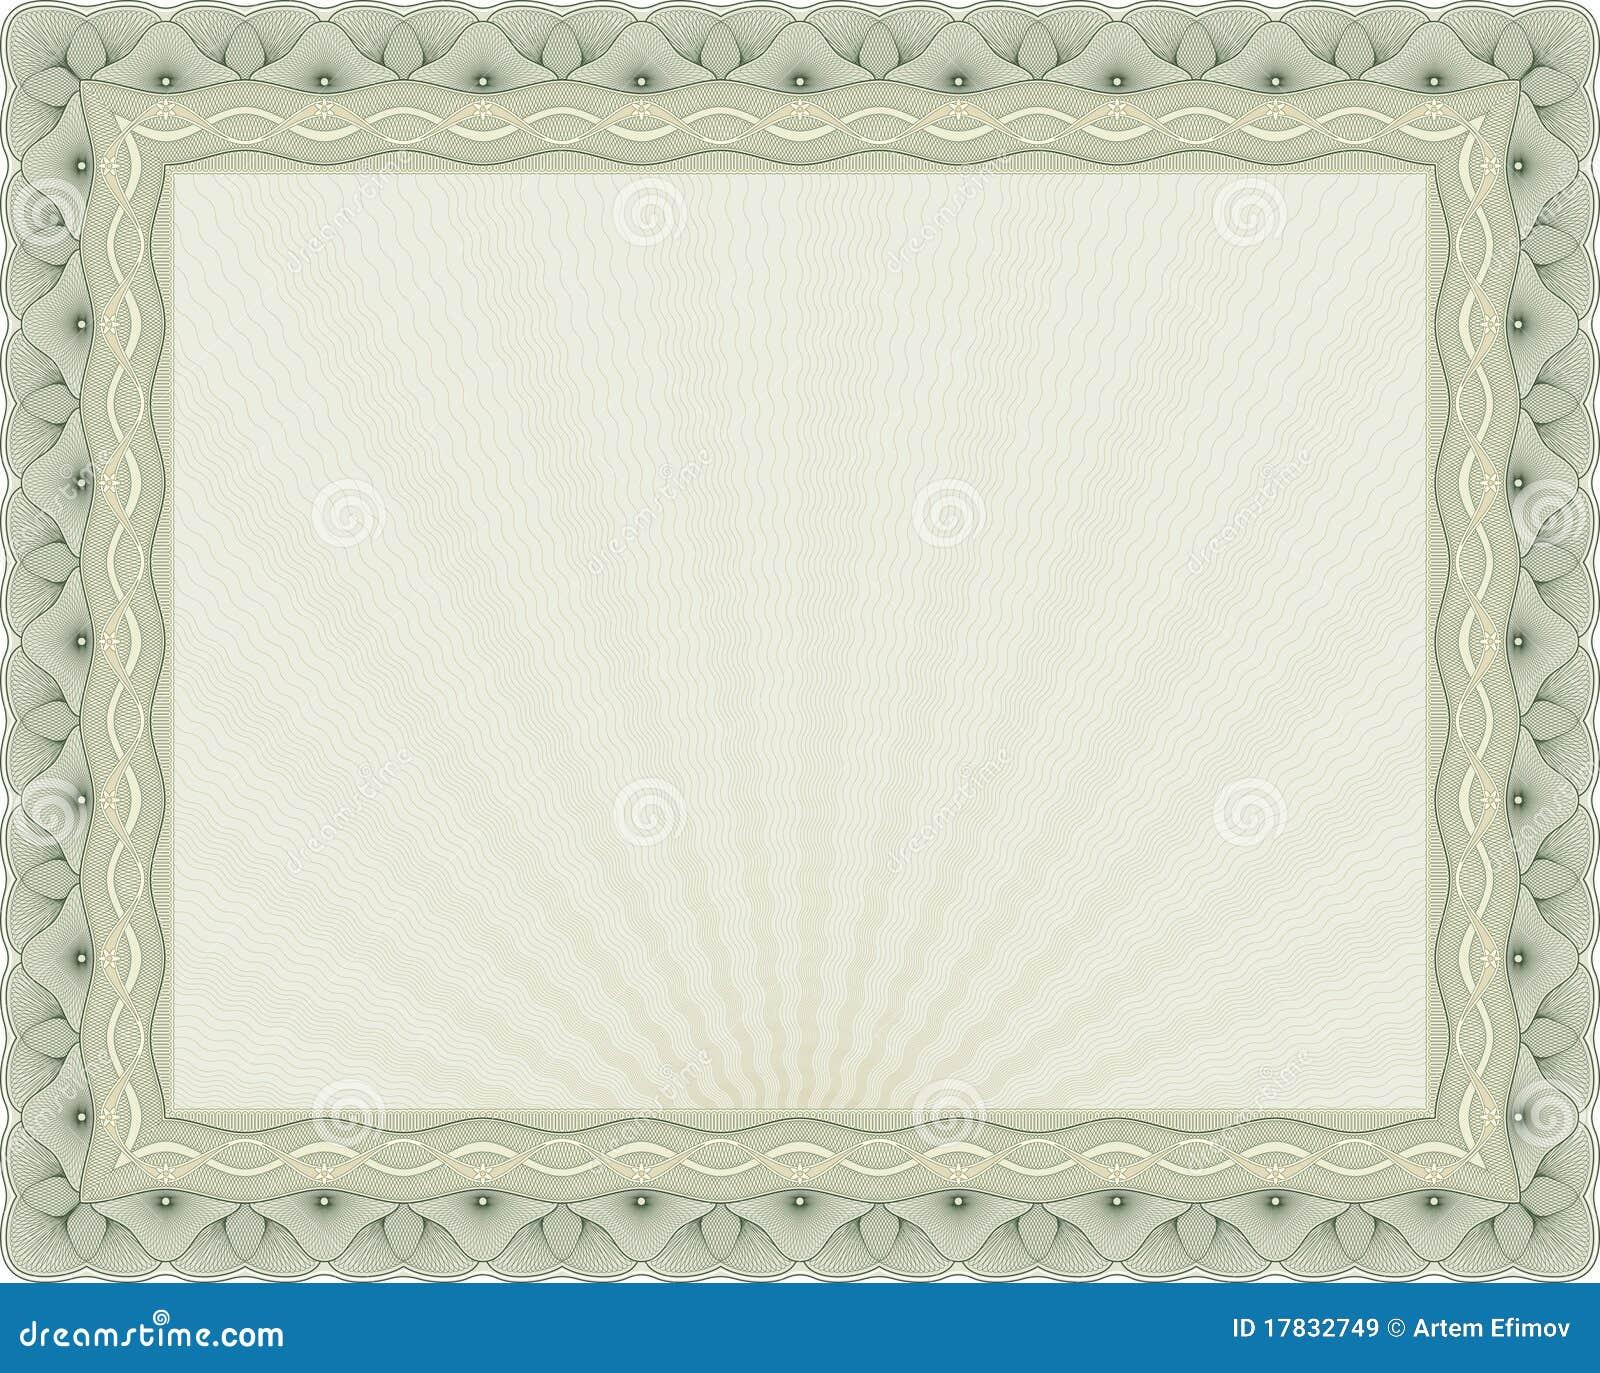 Certificate background 04